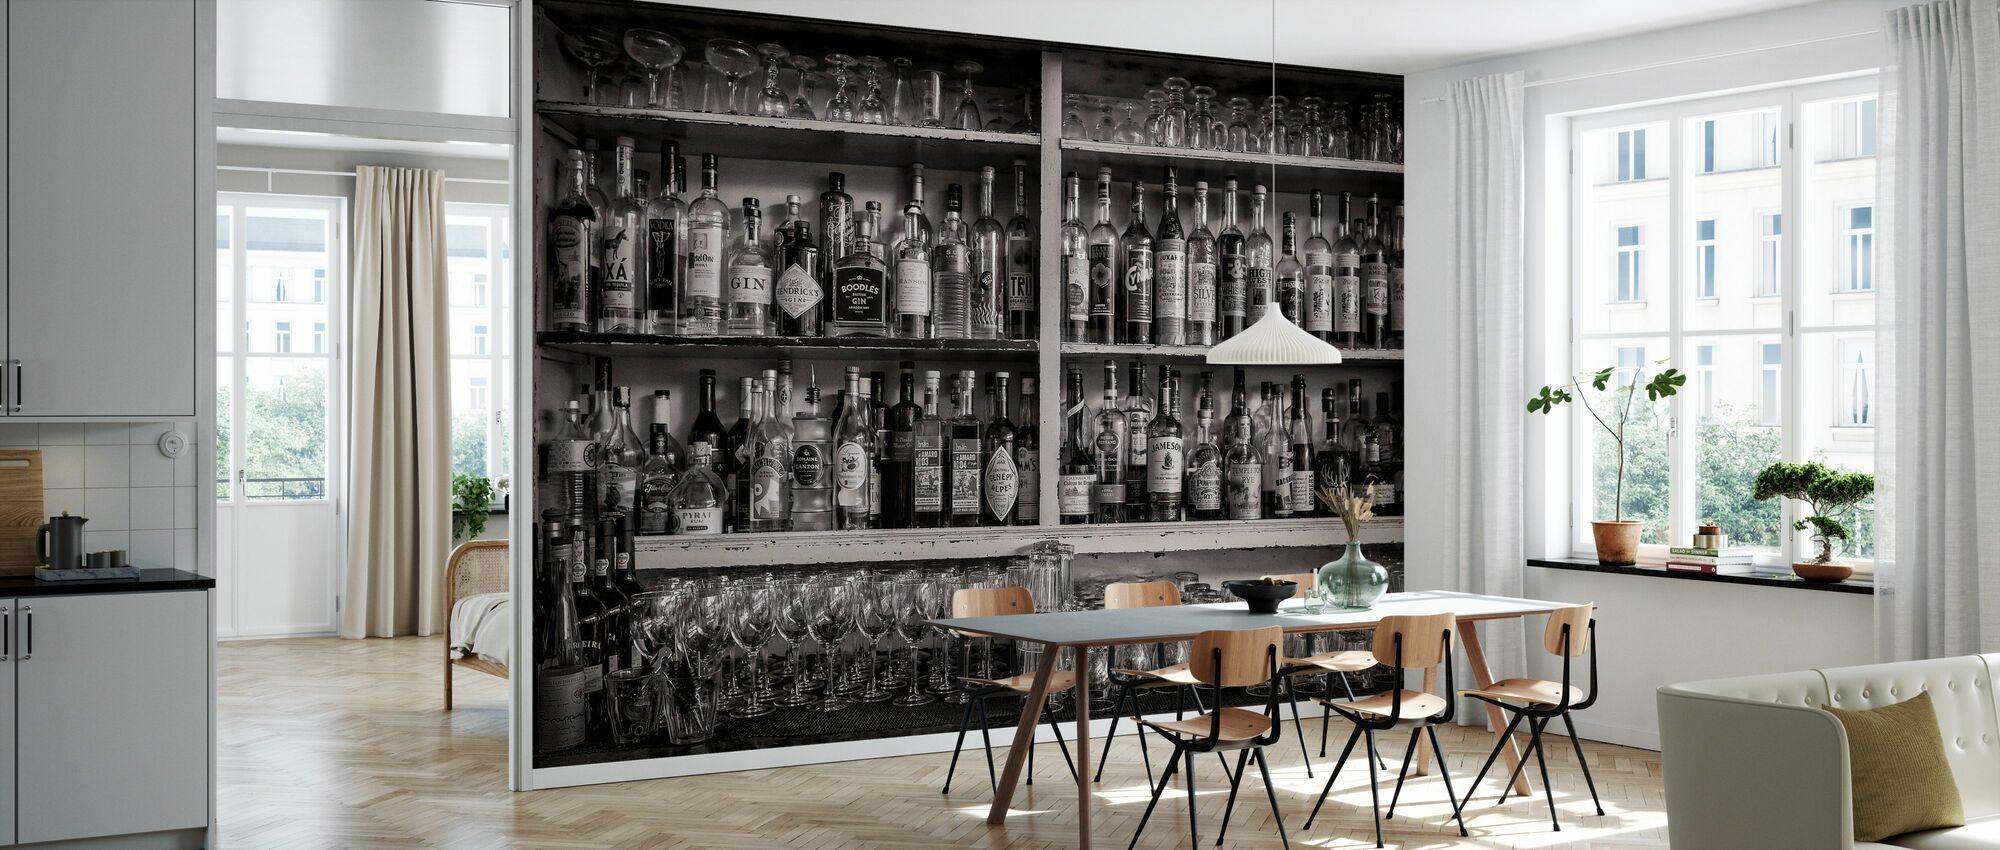 Seattle - Wallpaper - Kitchen